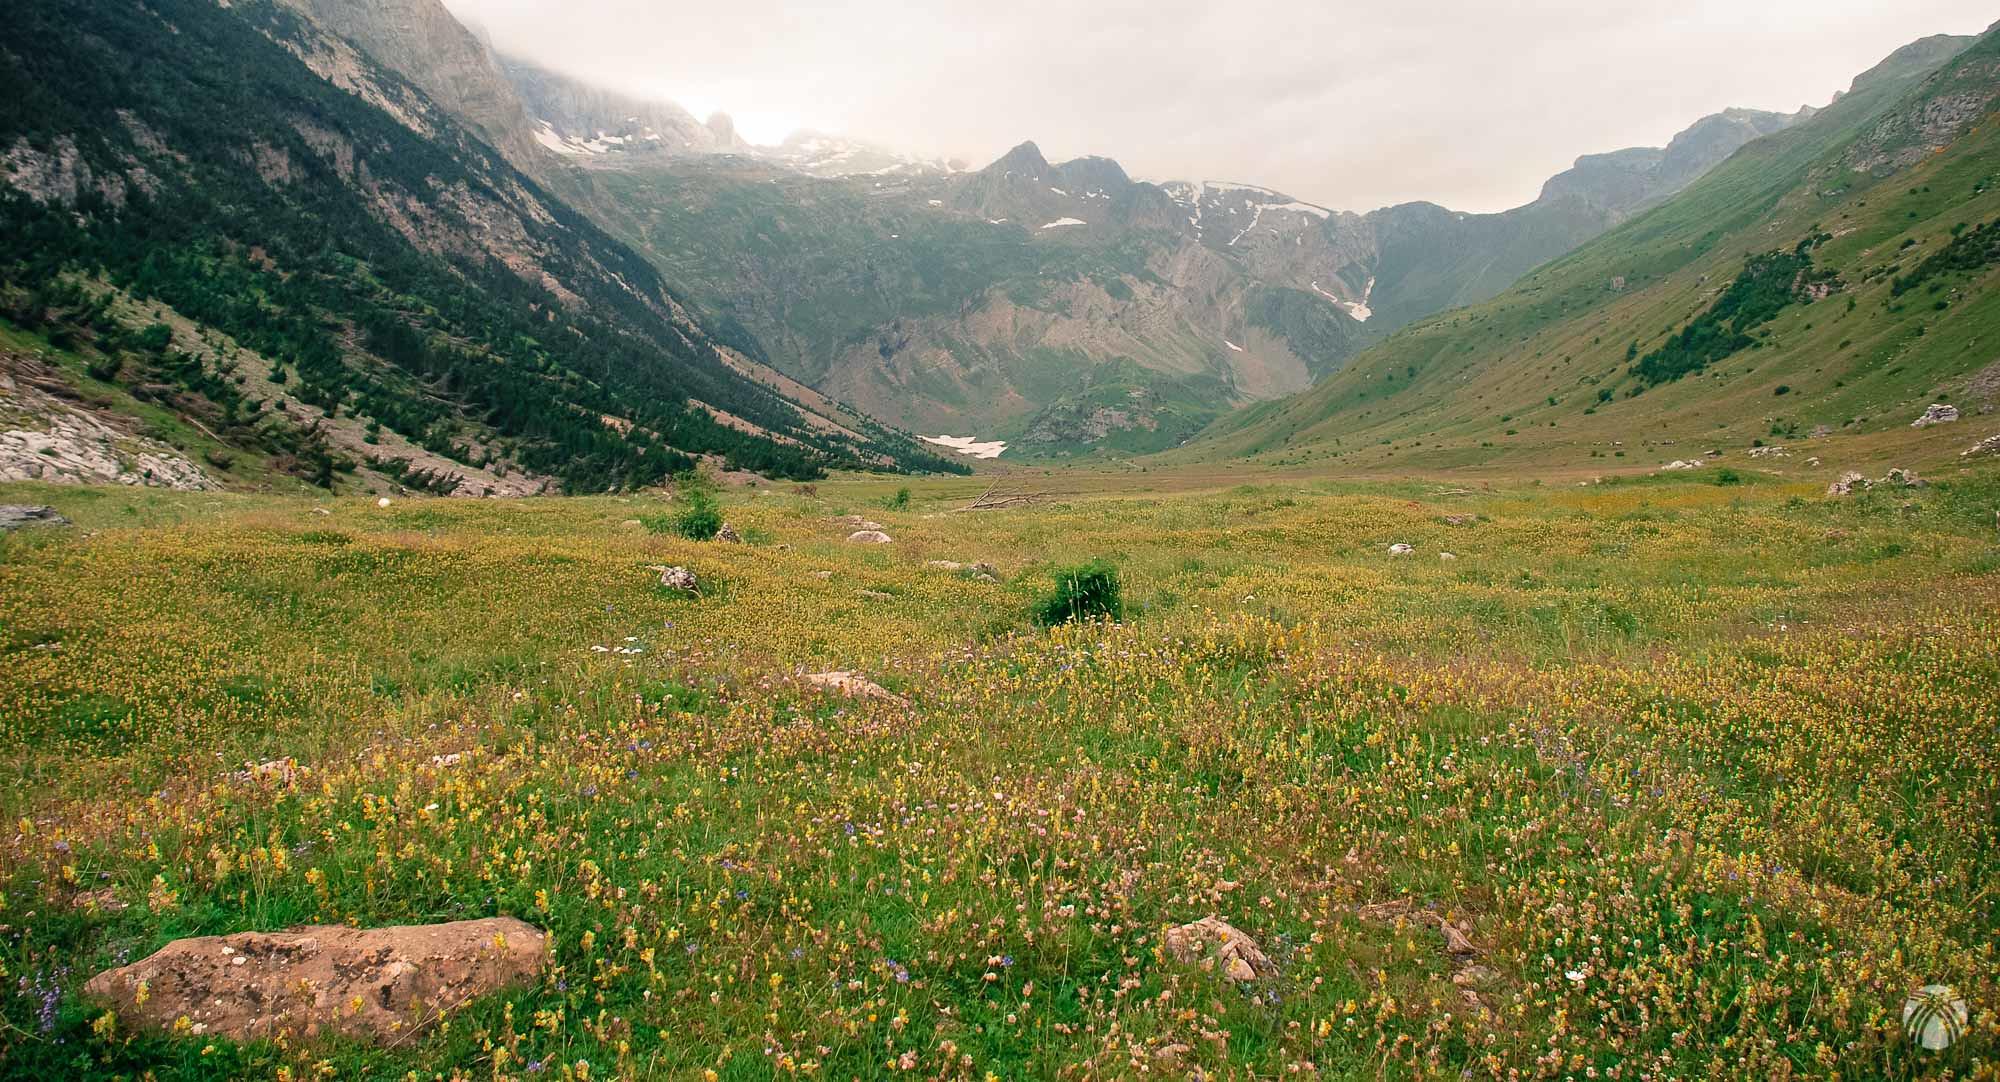 Valle de Otal. Valle glaciar